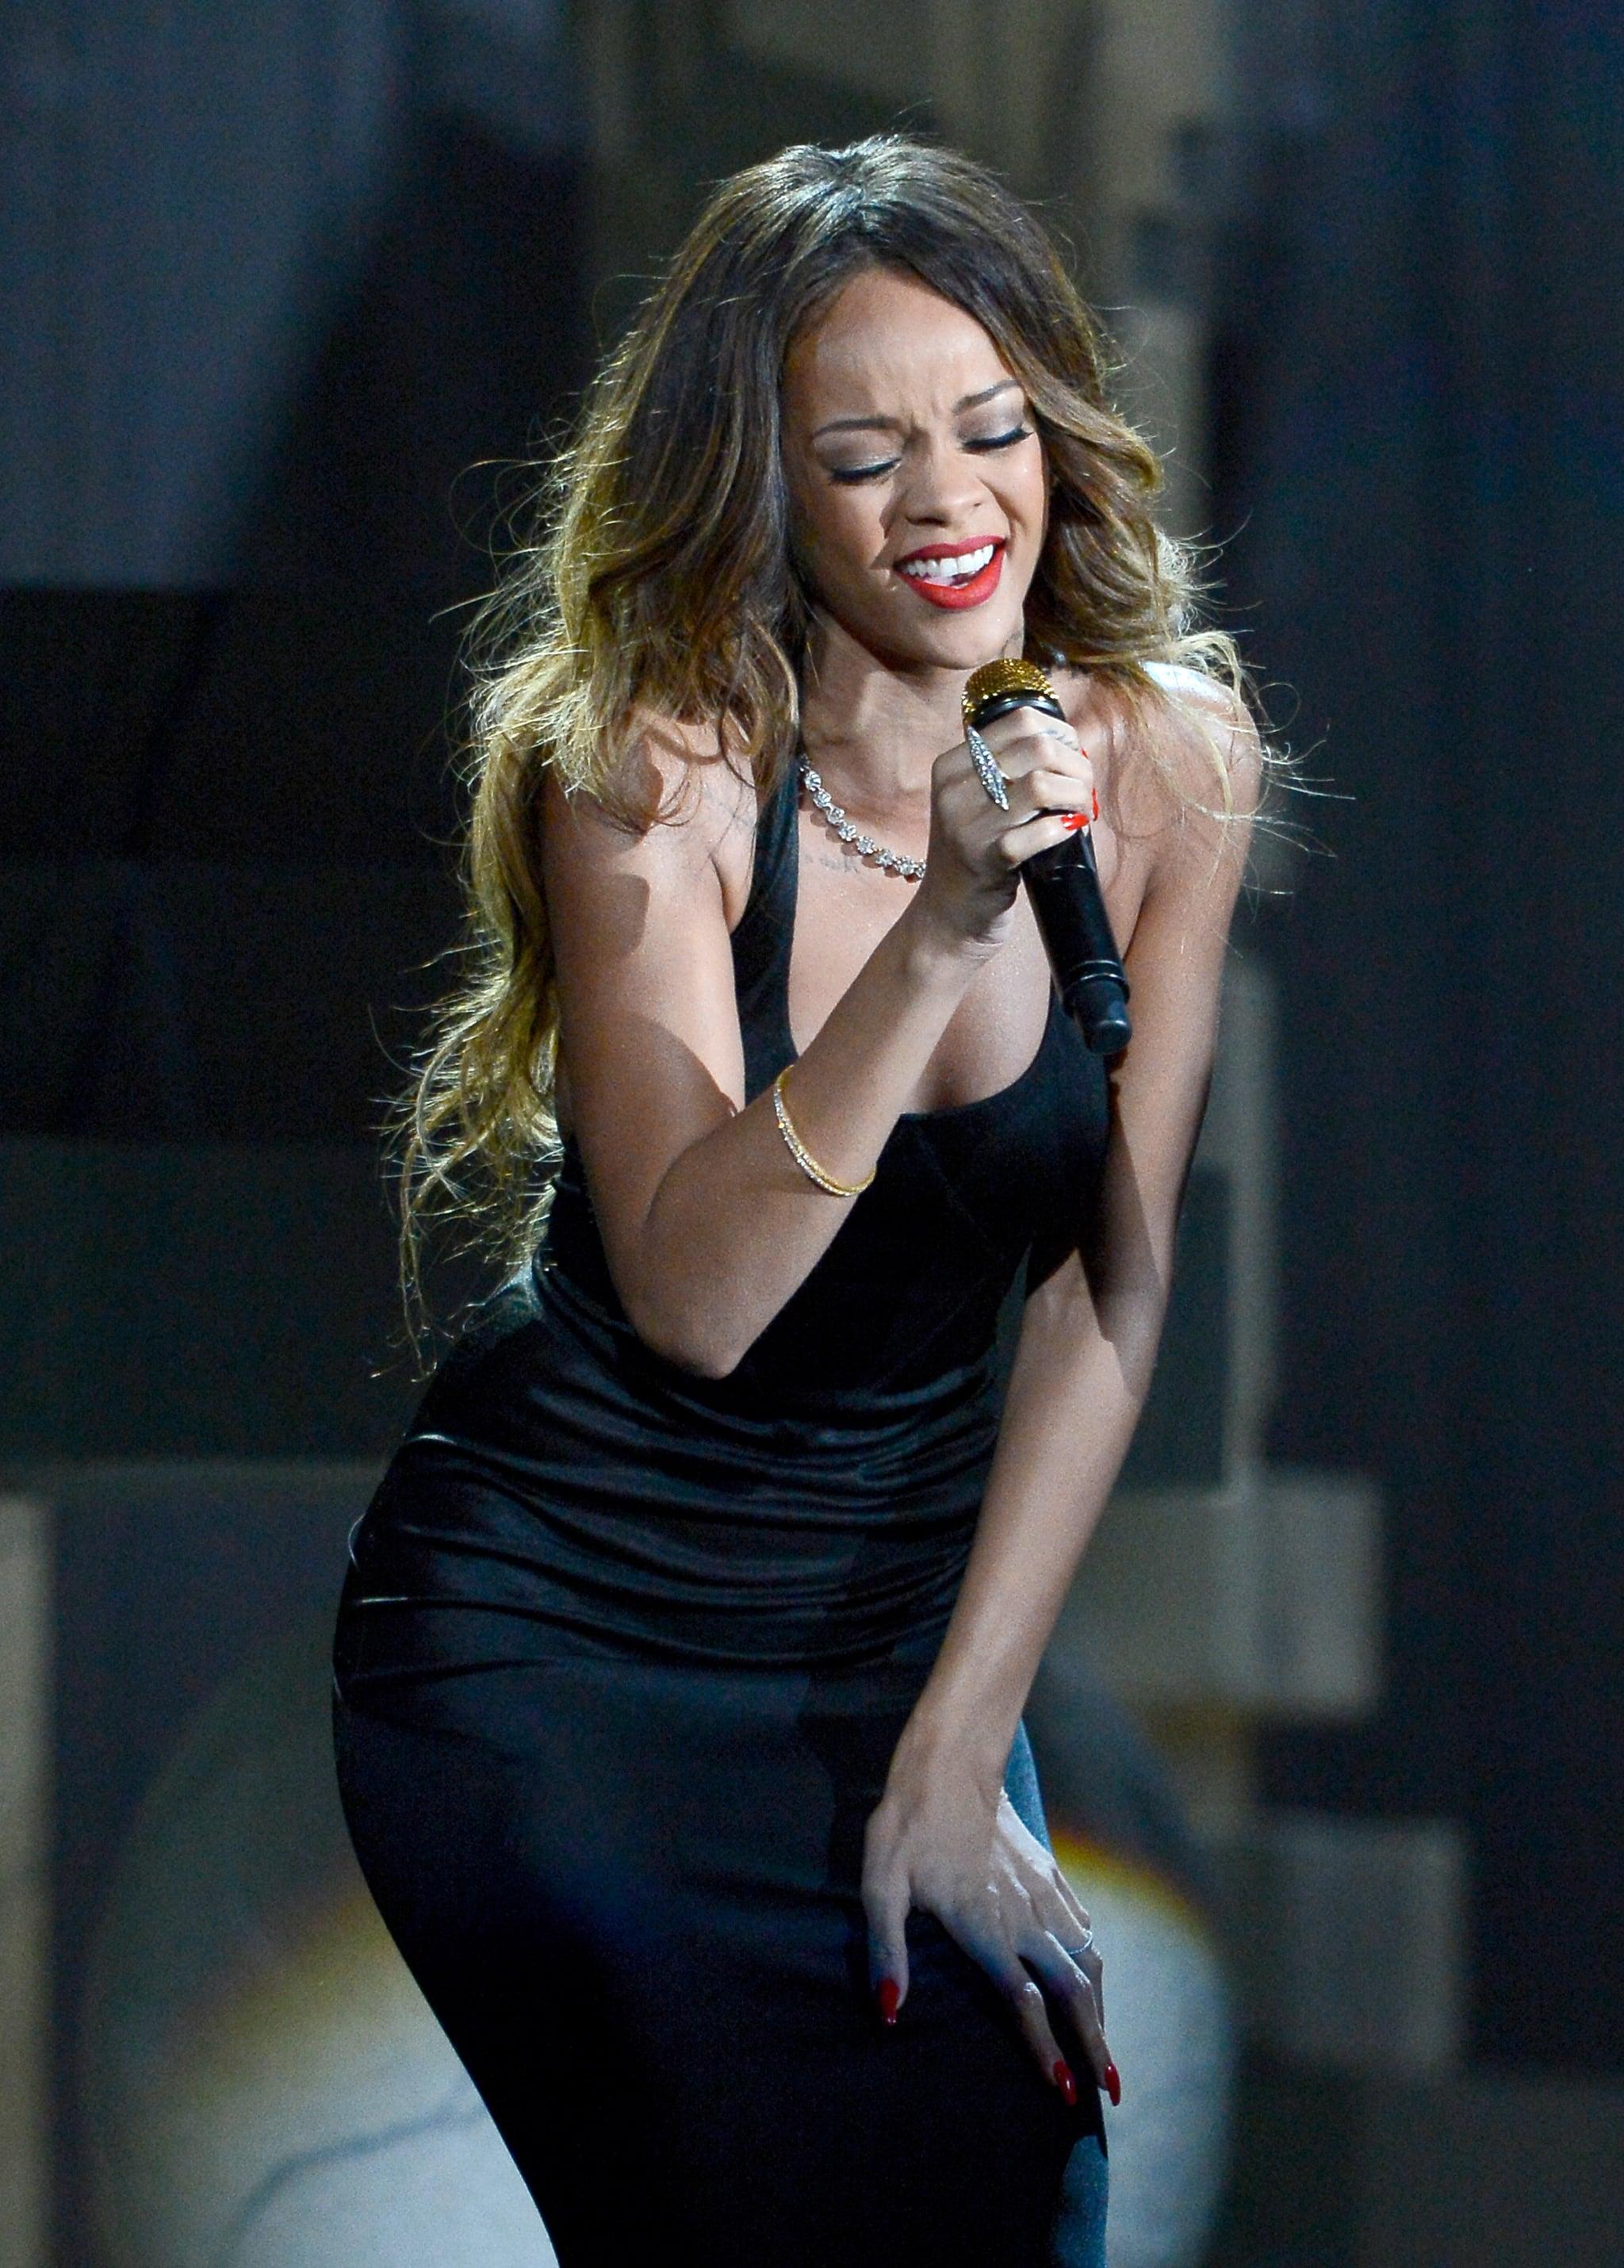 Rihanna performed at the Grammys.